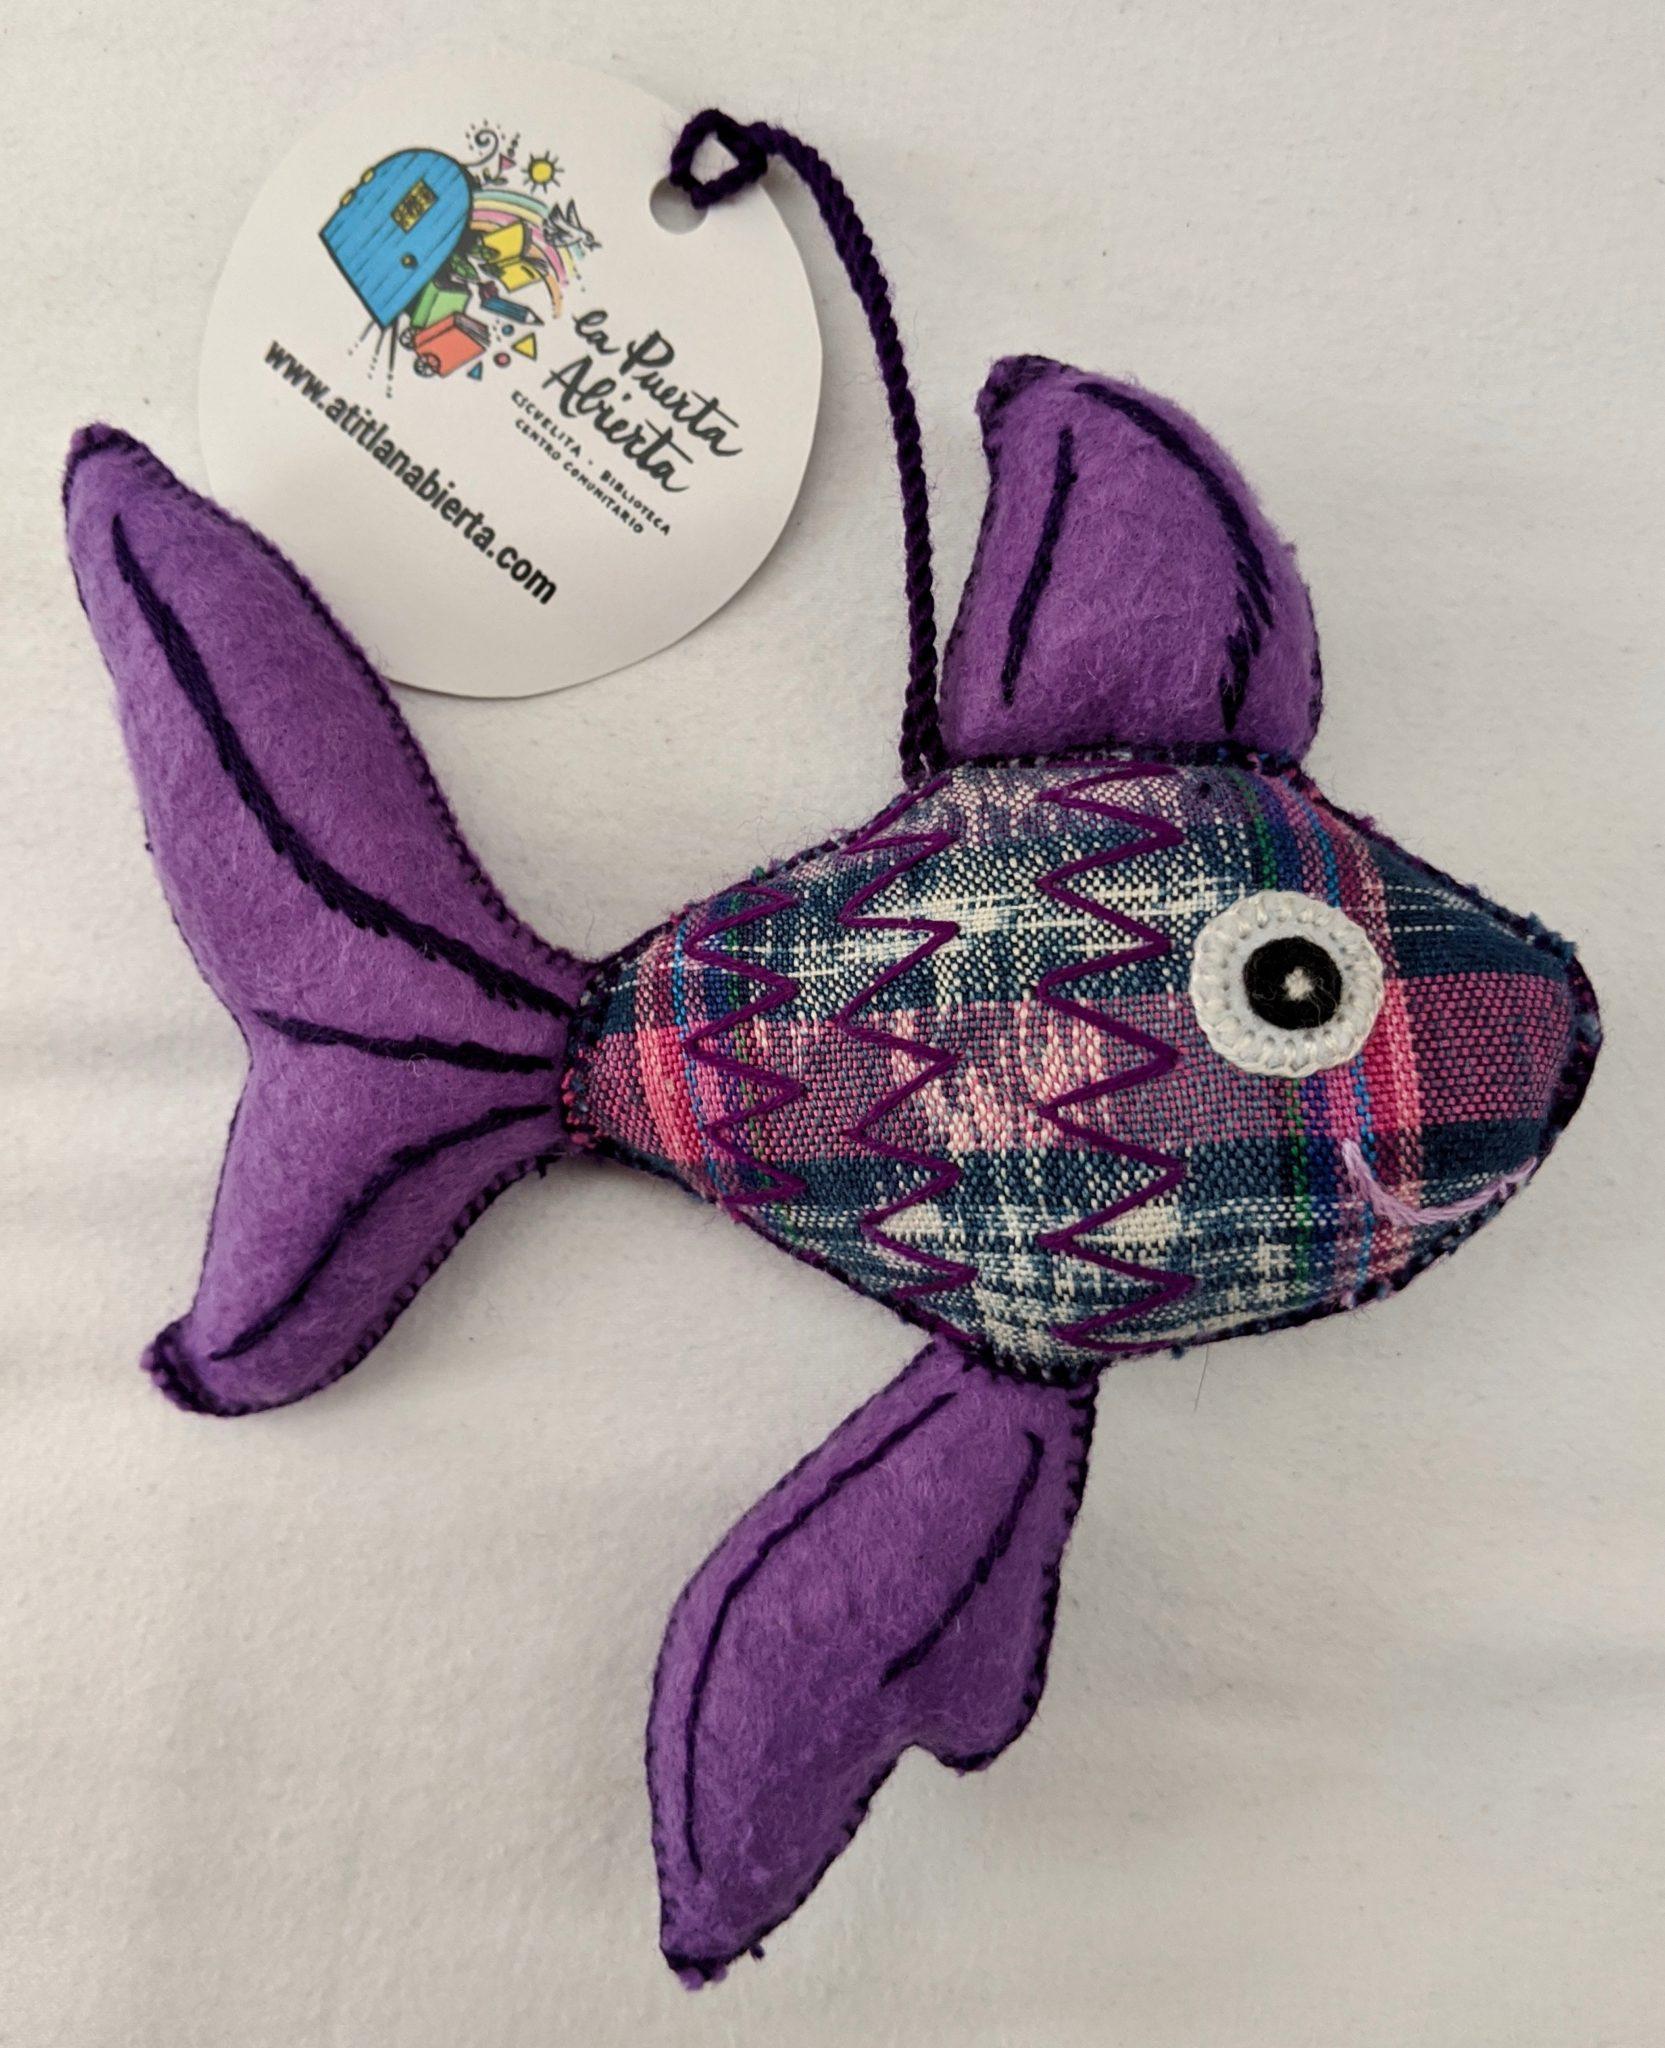 Fish Ornament - Felt and Repurposed Traditional Fabric